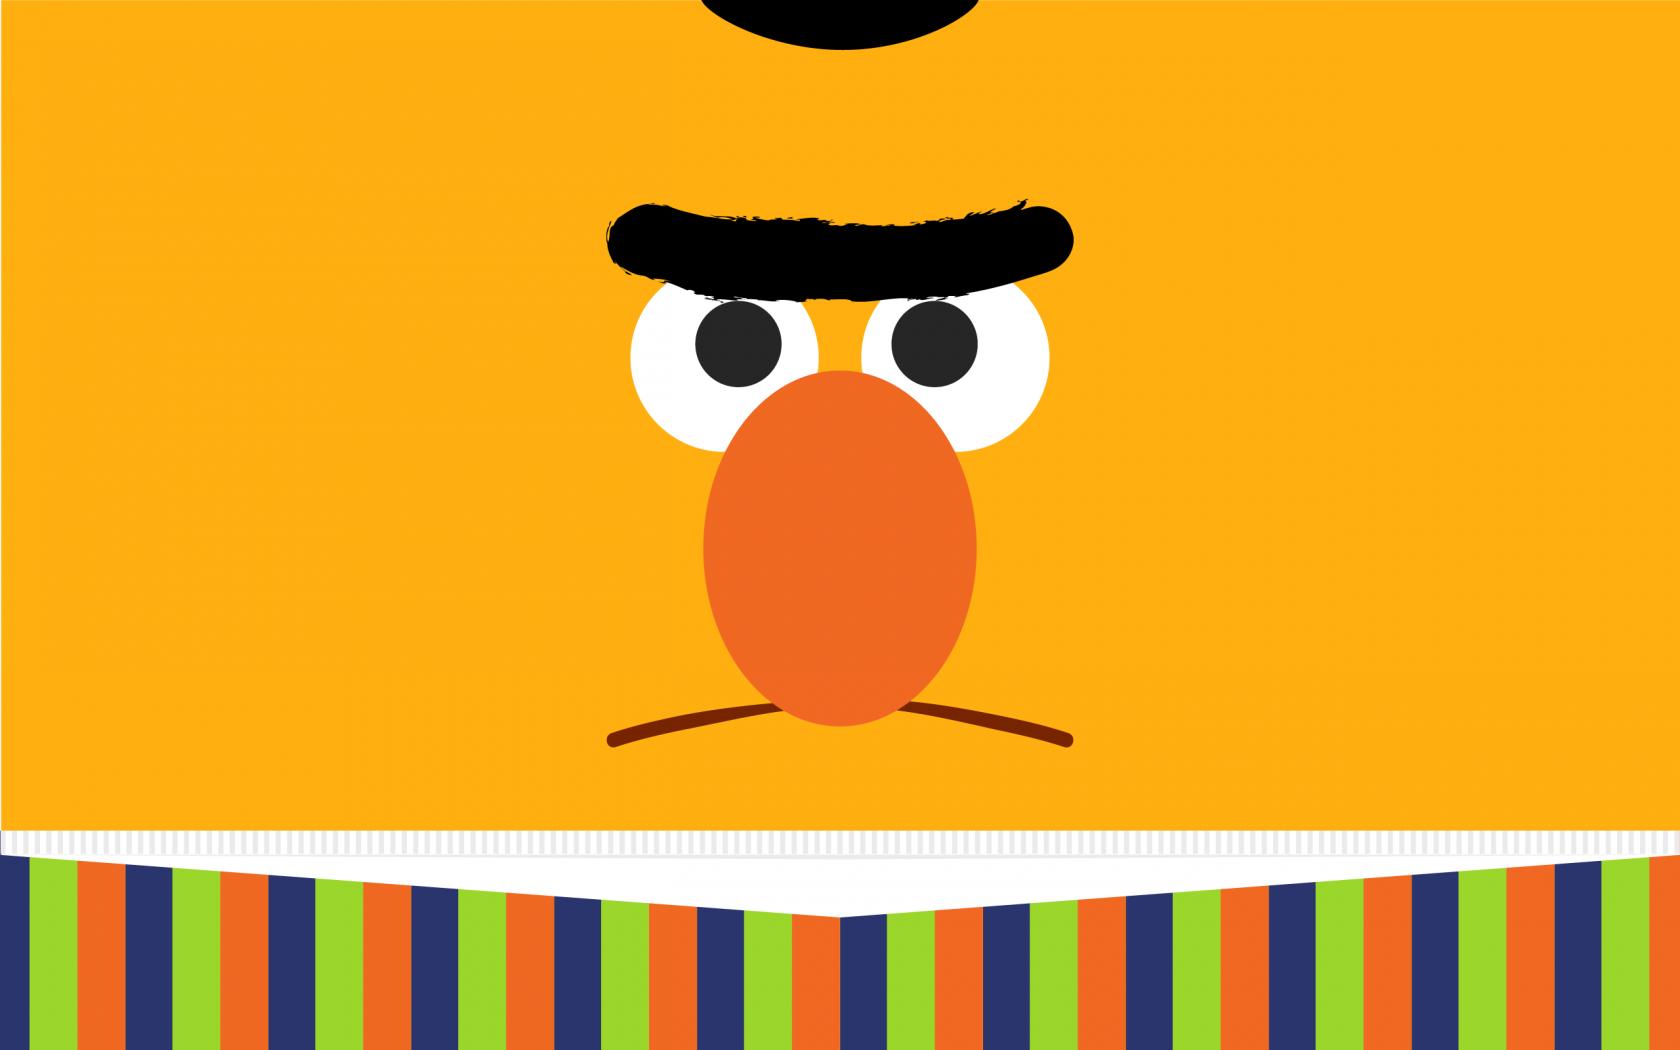 Wallpaper Of Bert From Sesame Street PaperPull 1680x1050